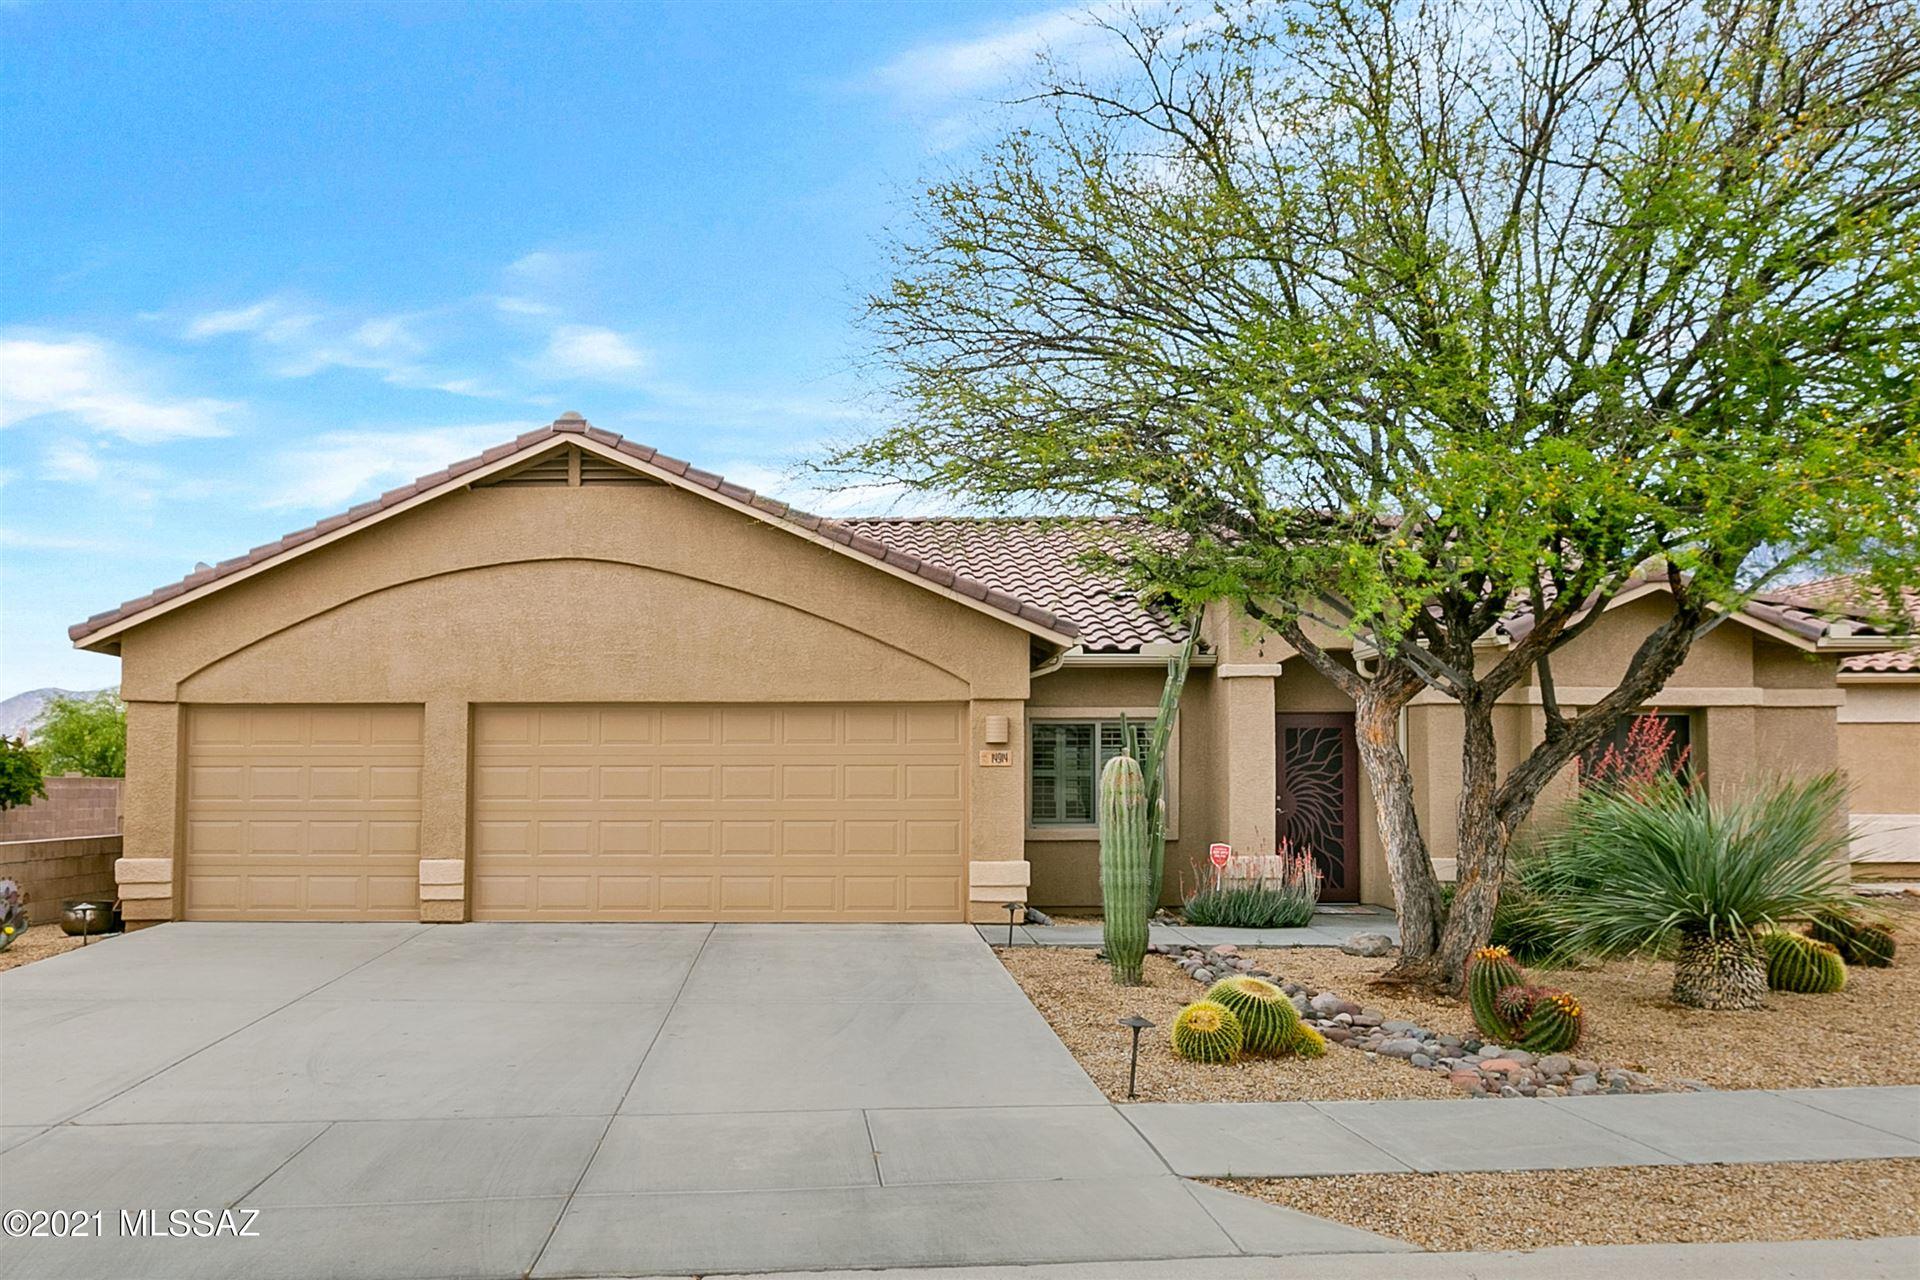 14914 N Capriole Drive, Tucson, AZ 85739 - #: 22111056